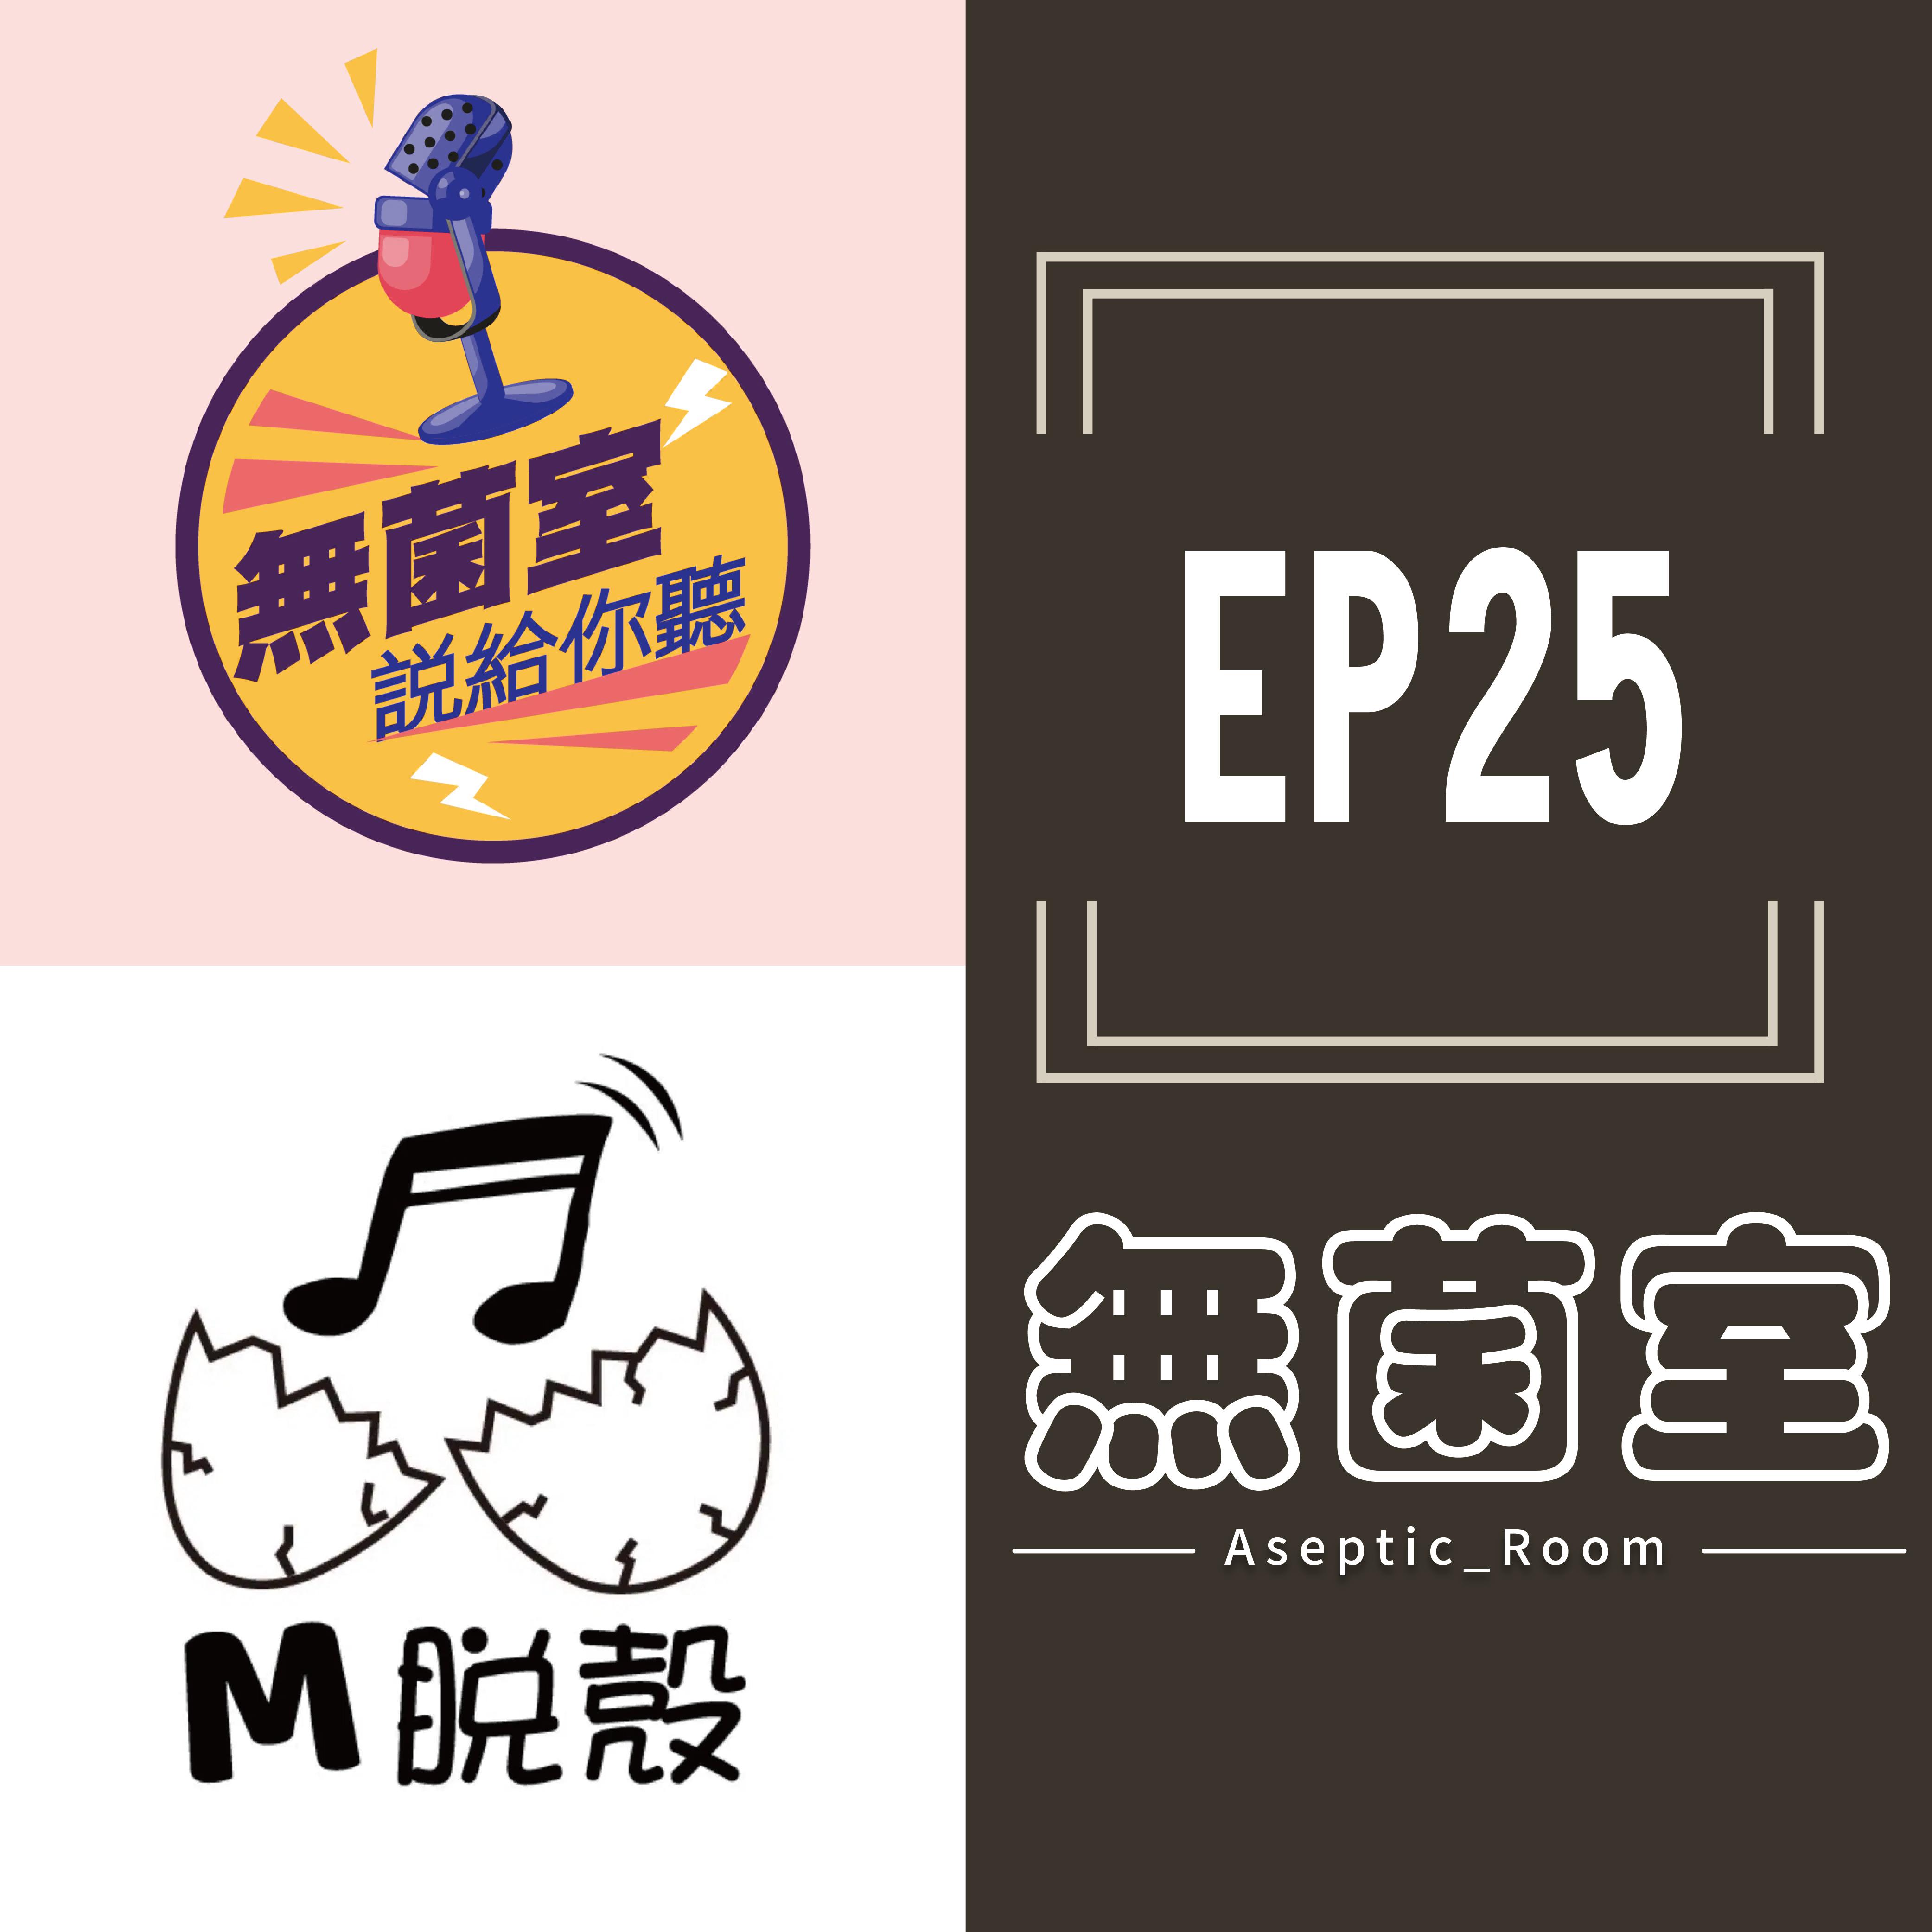 EP25【有機雜貨店】無菌室的文藝復興時代來臨!今天來點古典音樂賞析!feat.羅仙|M脫殼